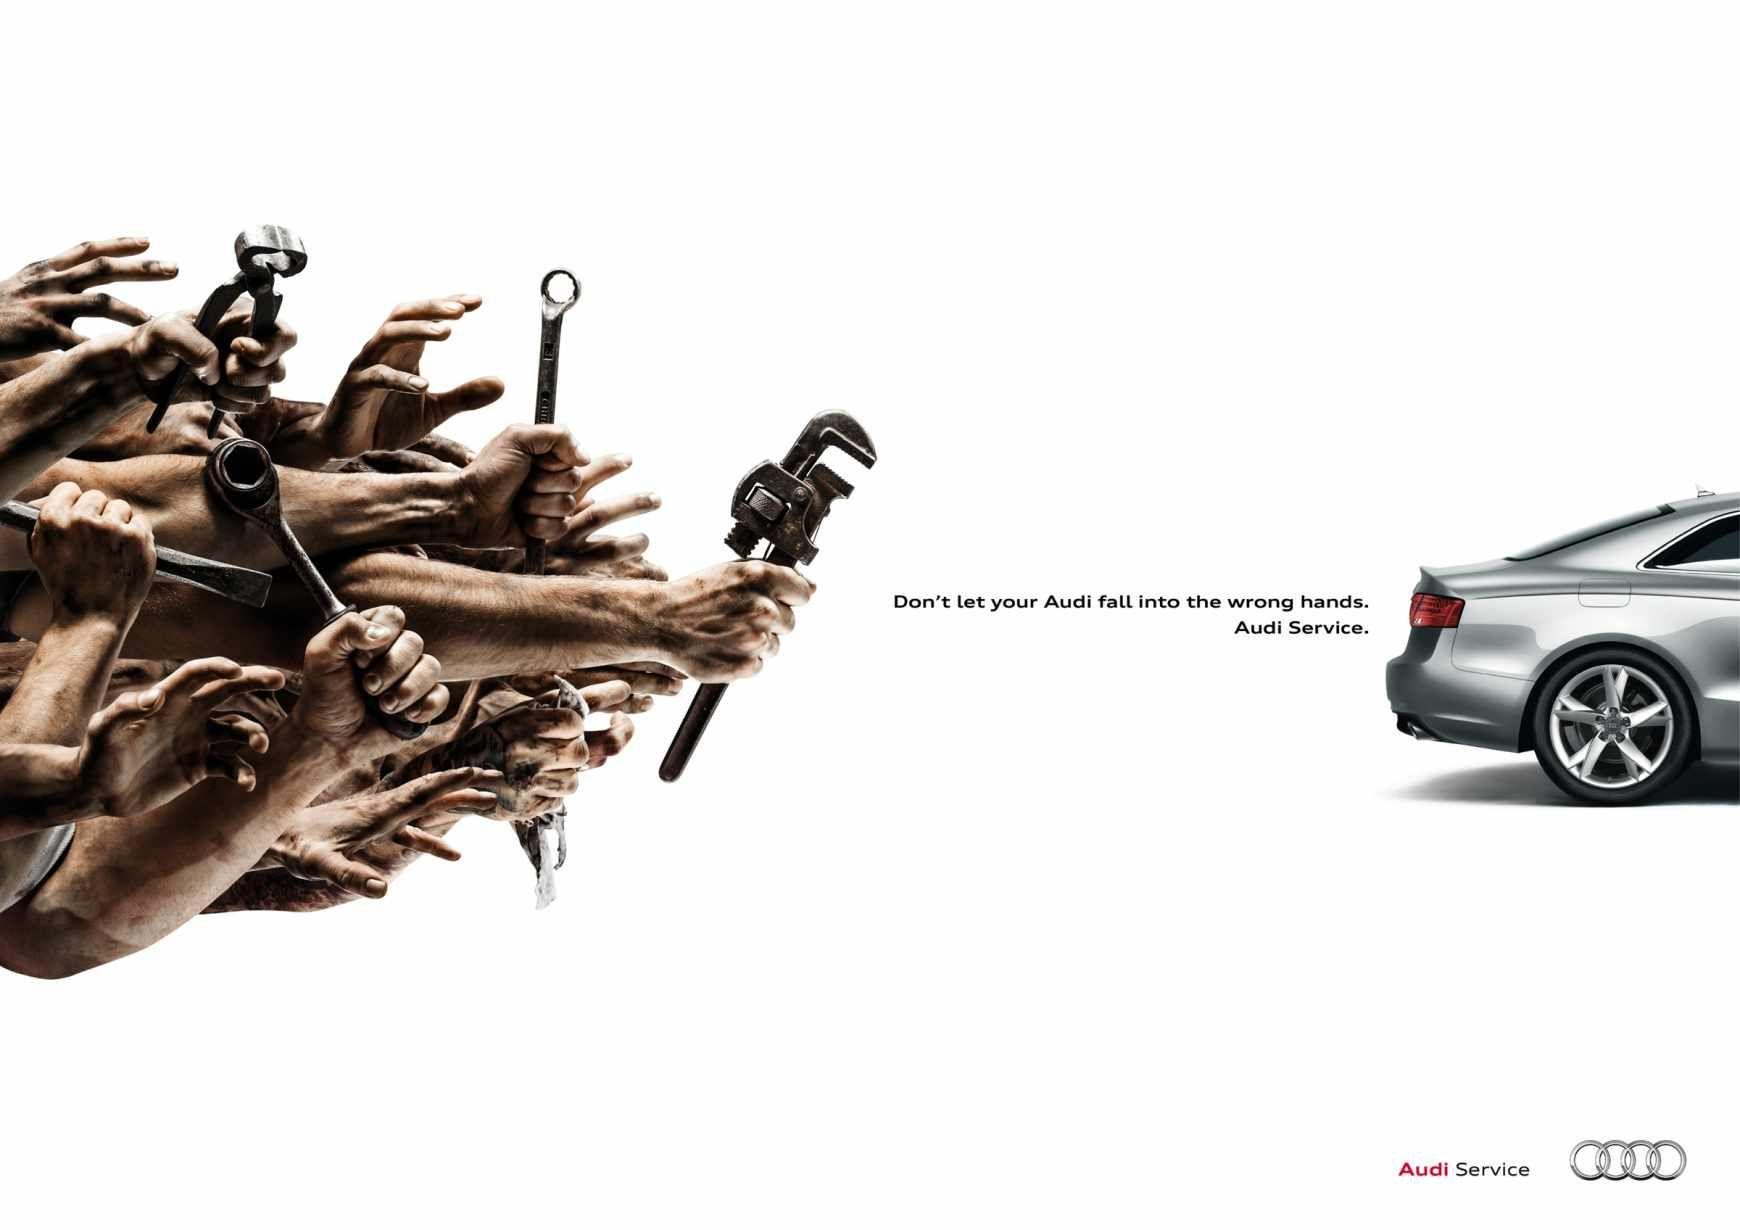 Audi wrench advertising agency thjnk berlin advertisement audi wrench advertising agency thjnk berlin buycottarizona